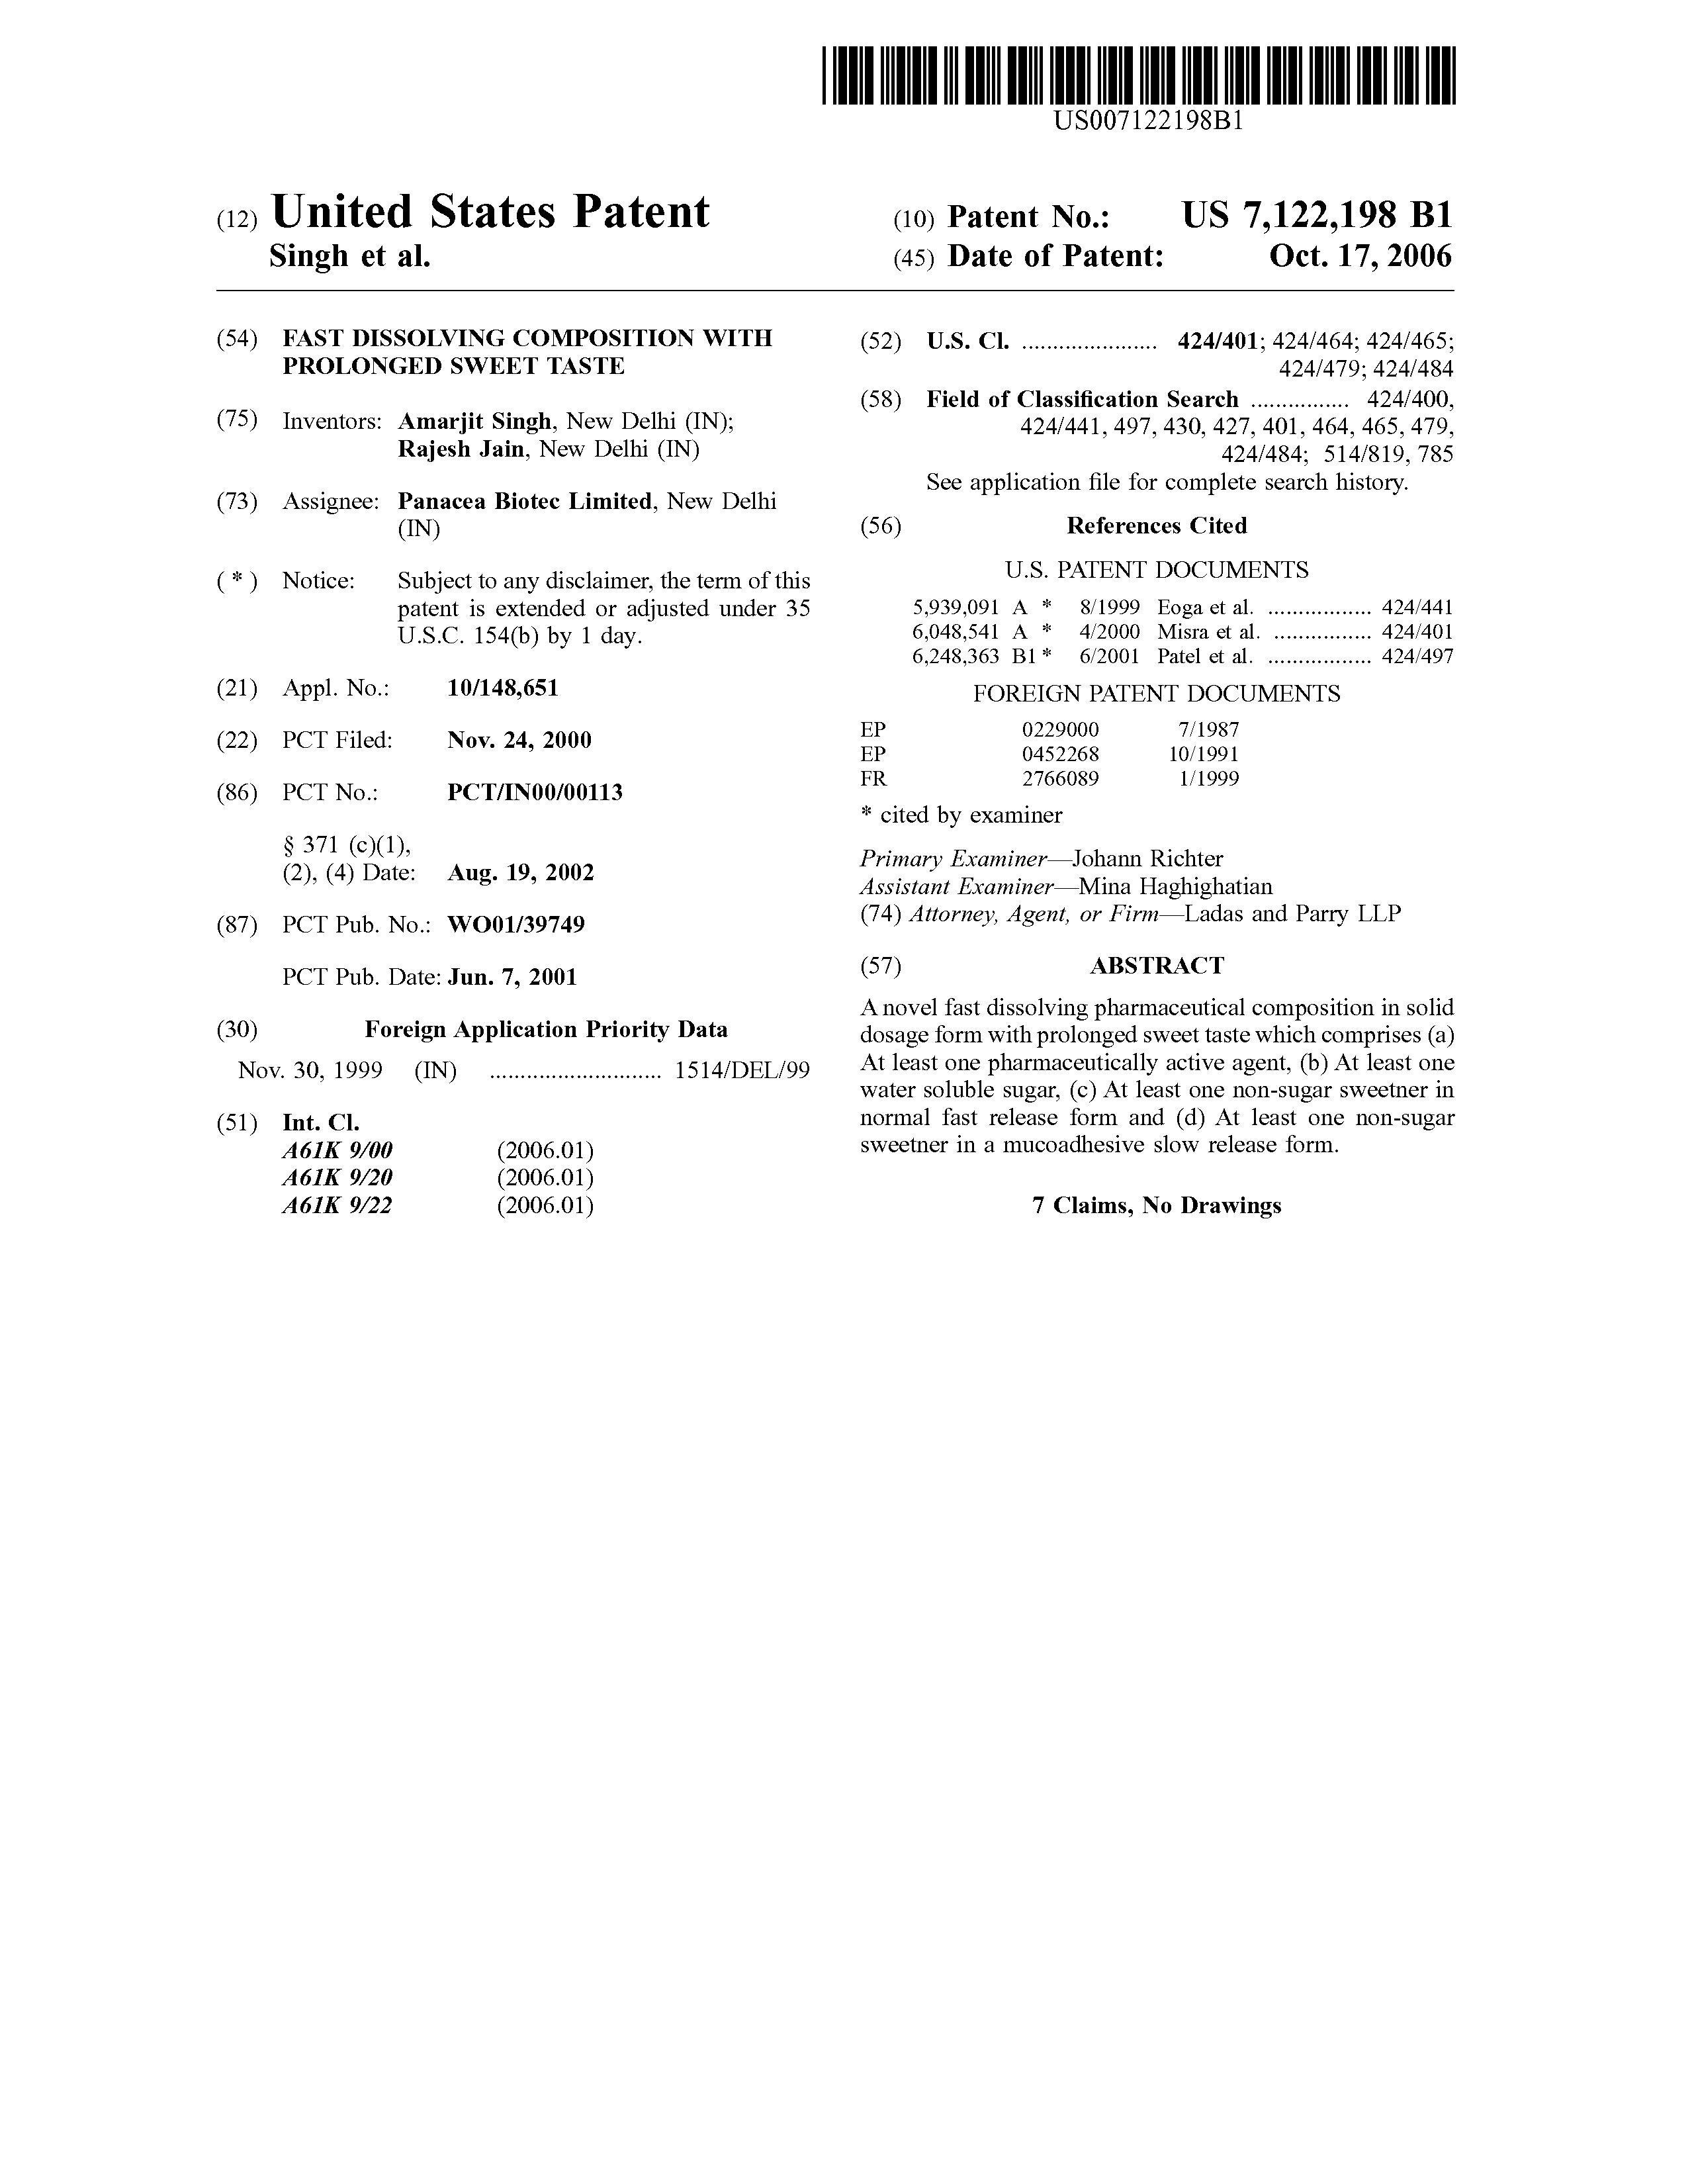 Dydrogesterone patent expiration